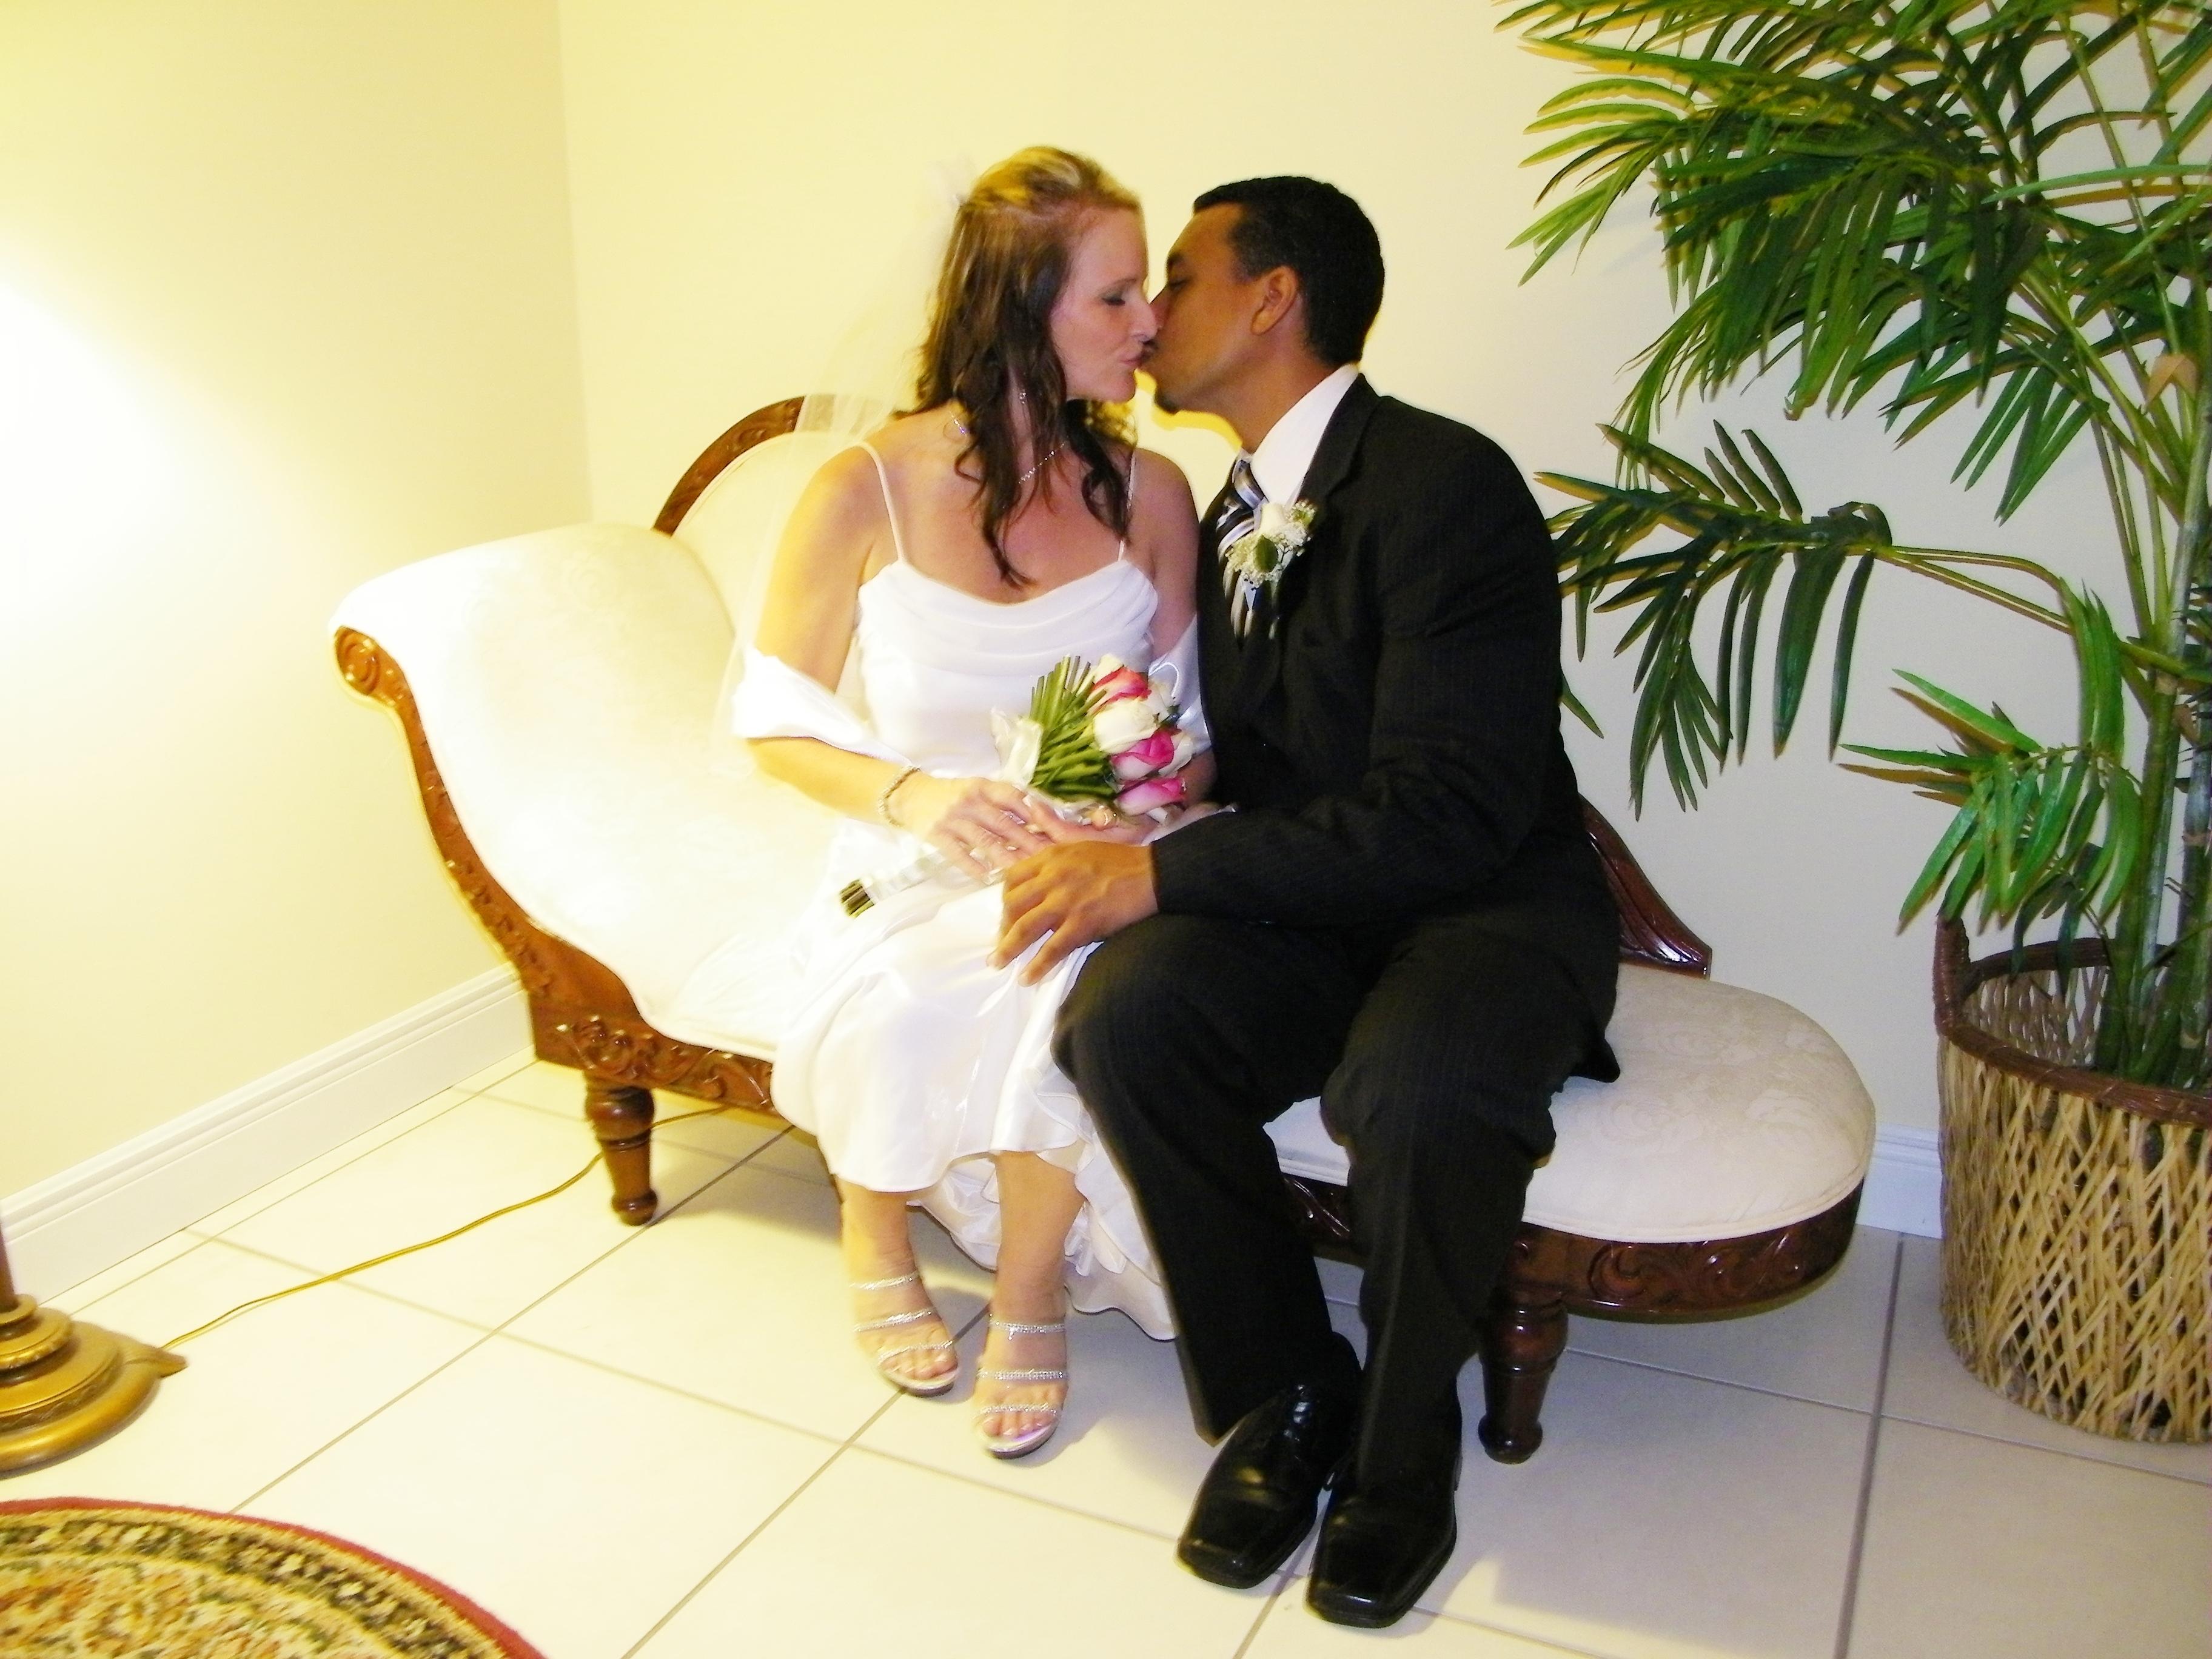 chapel husband wife